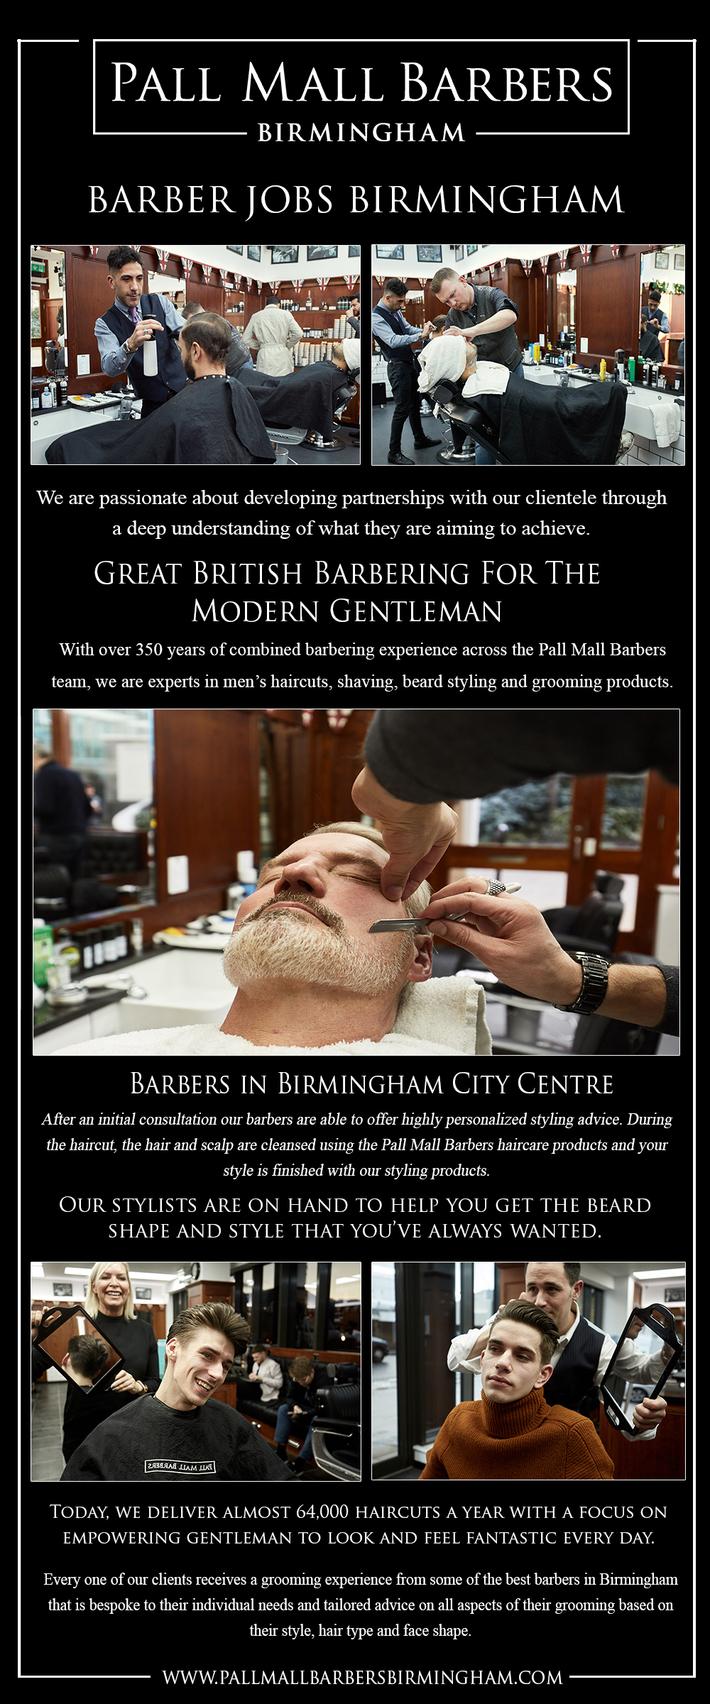 Barber Jobs Birmingham   Call 01217941693   pallmallbarbersbirmingham.com